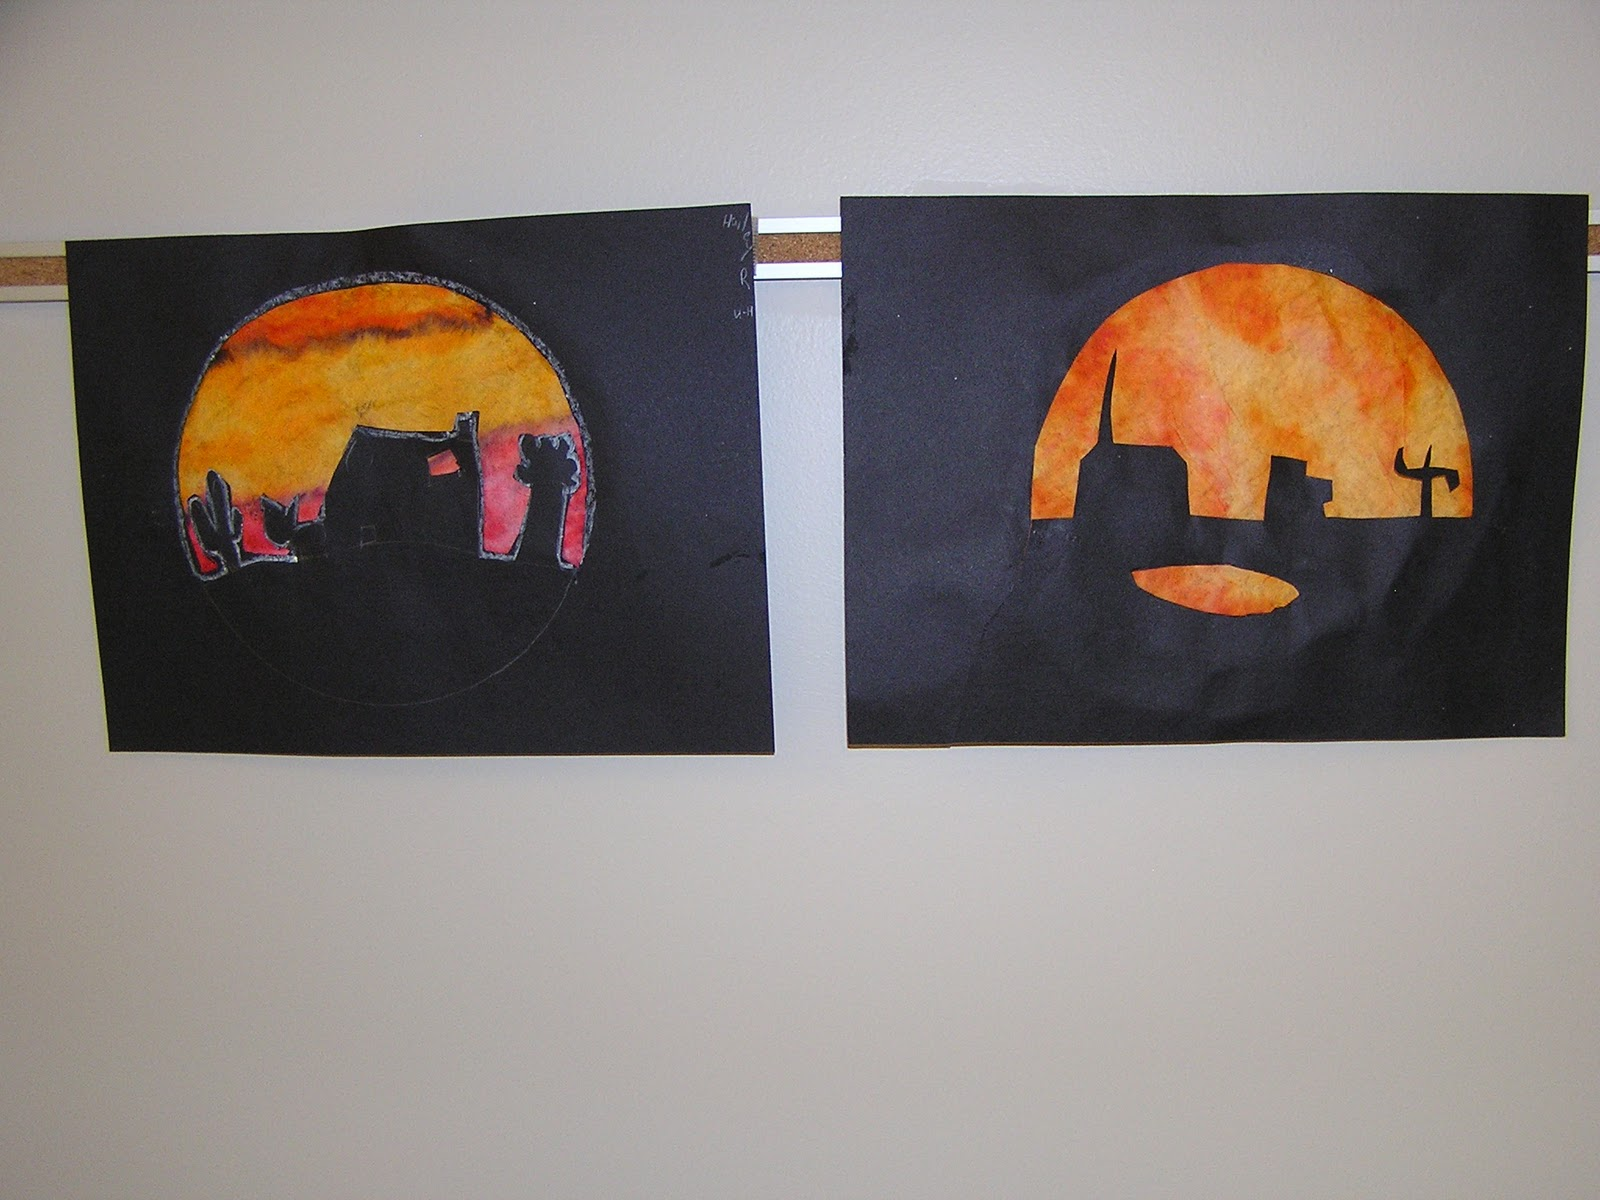 B Art: B Art Z- Elementary Art: 4th Grade Silhouettes